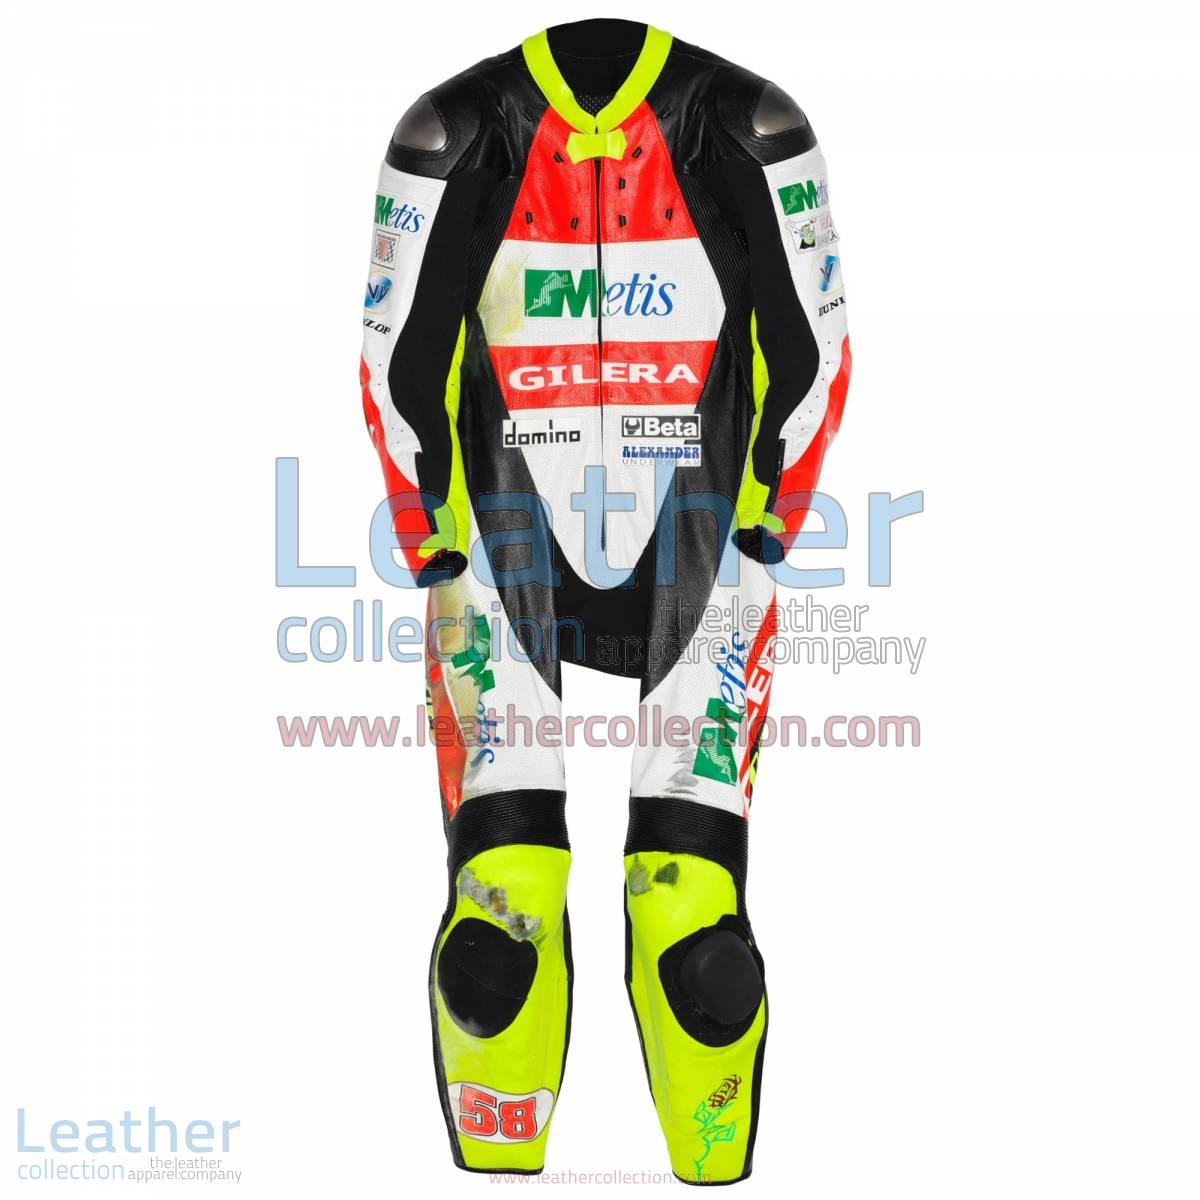 Marco Simoncelli Gilera GP 2007 Leather Suit   leather suit